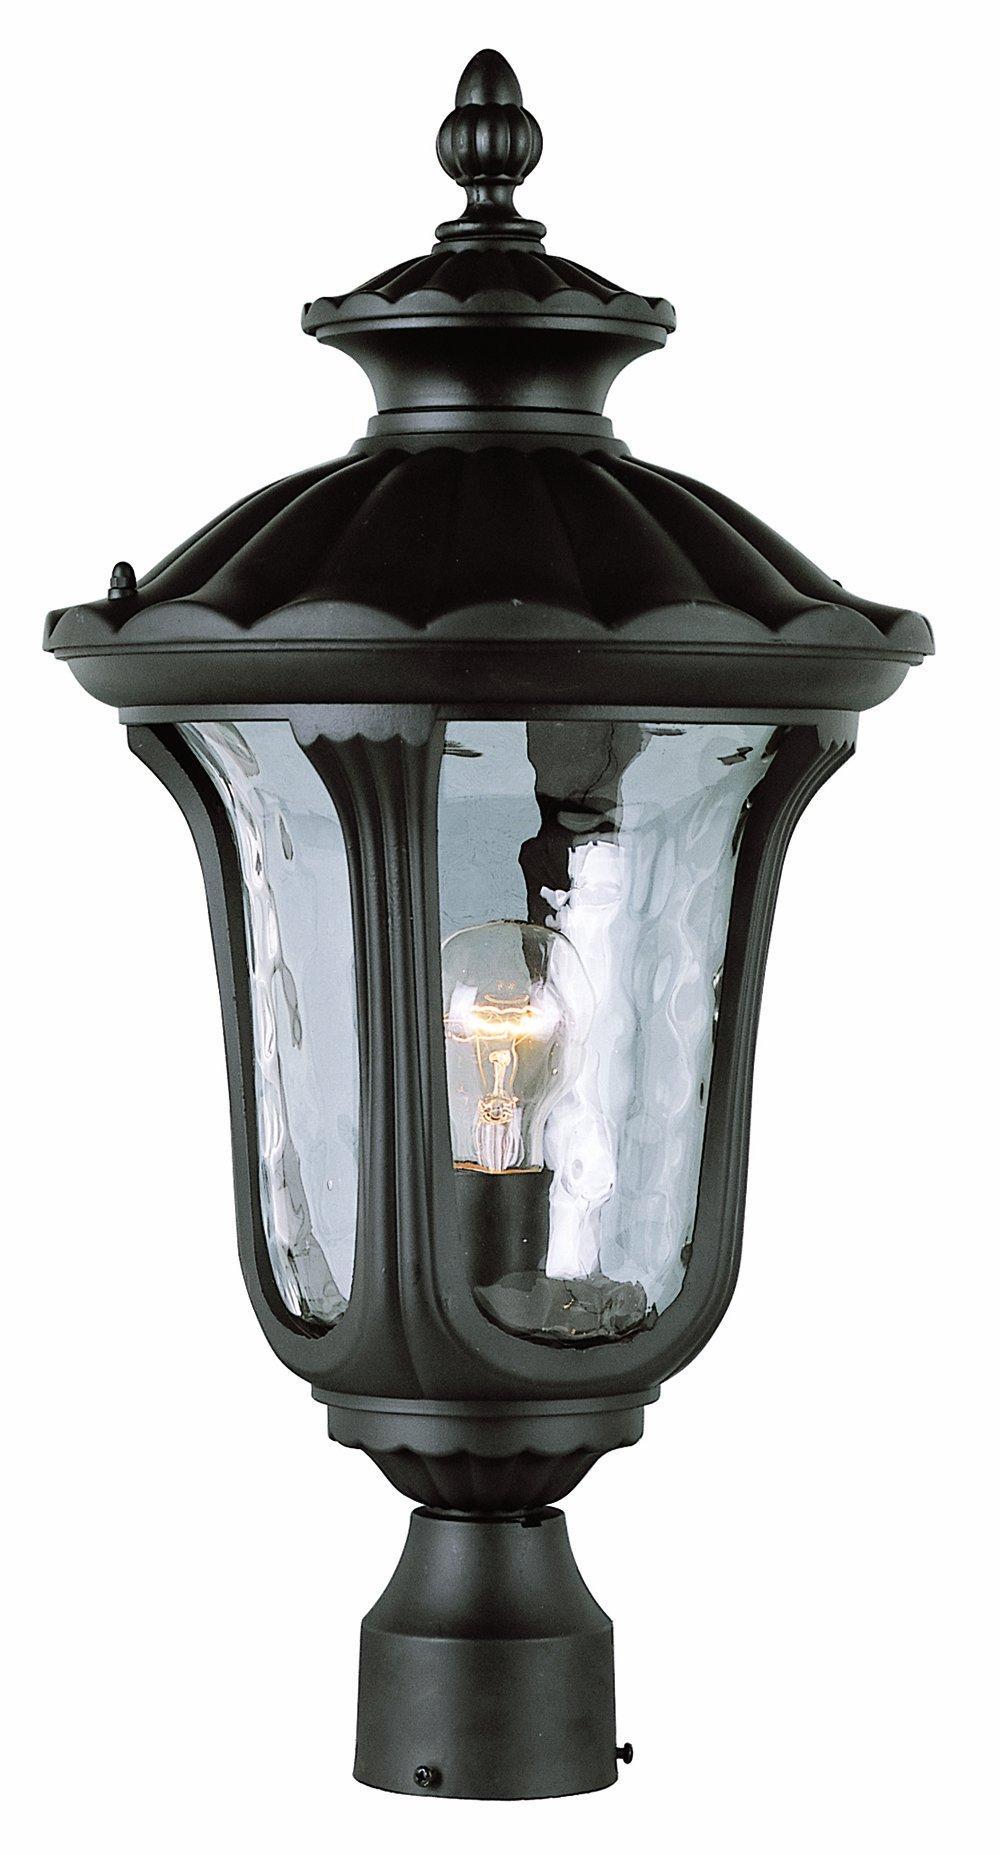 Trans Globe Lighting 5913 RT Outdoor Knolls 21'' Postmount Lantern, Rust by Trans Globe Lighting